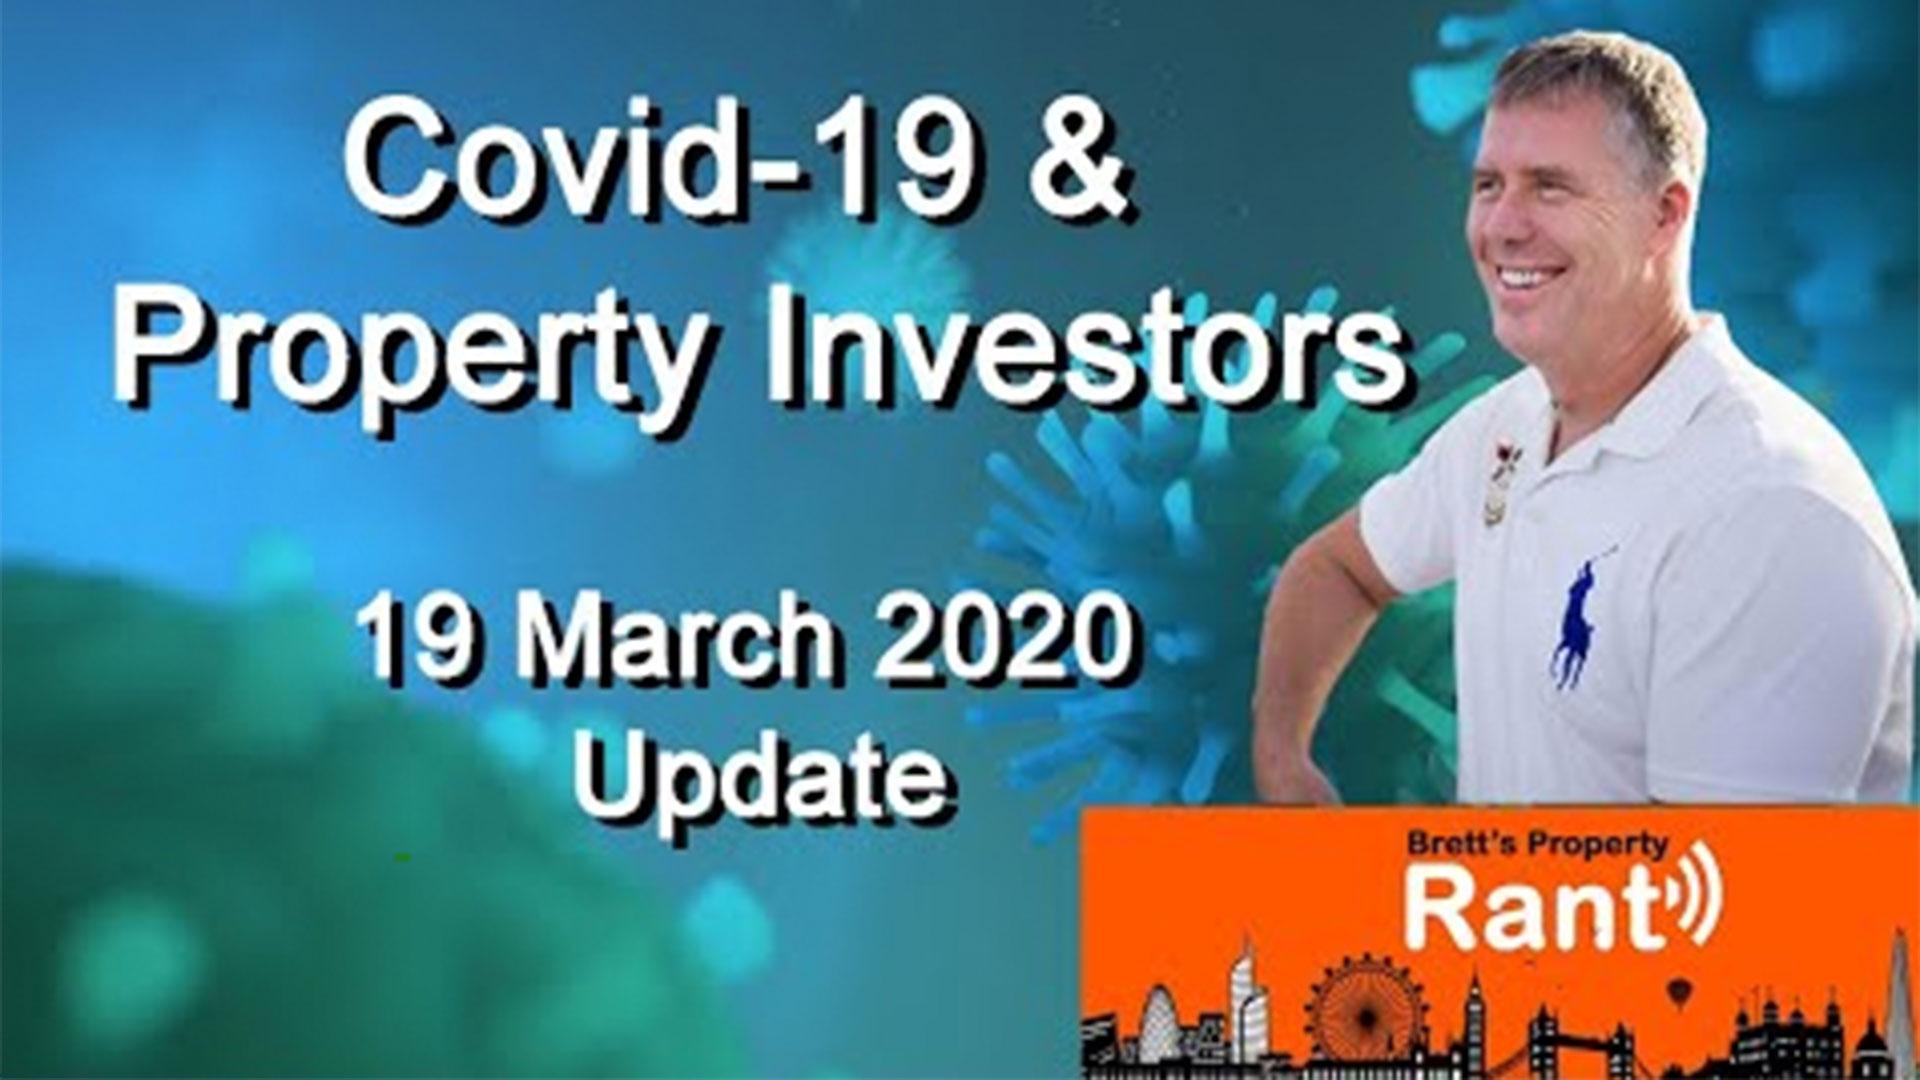 UK Property Investors